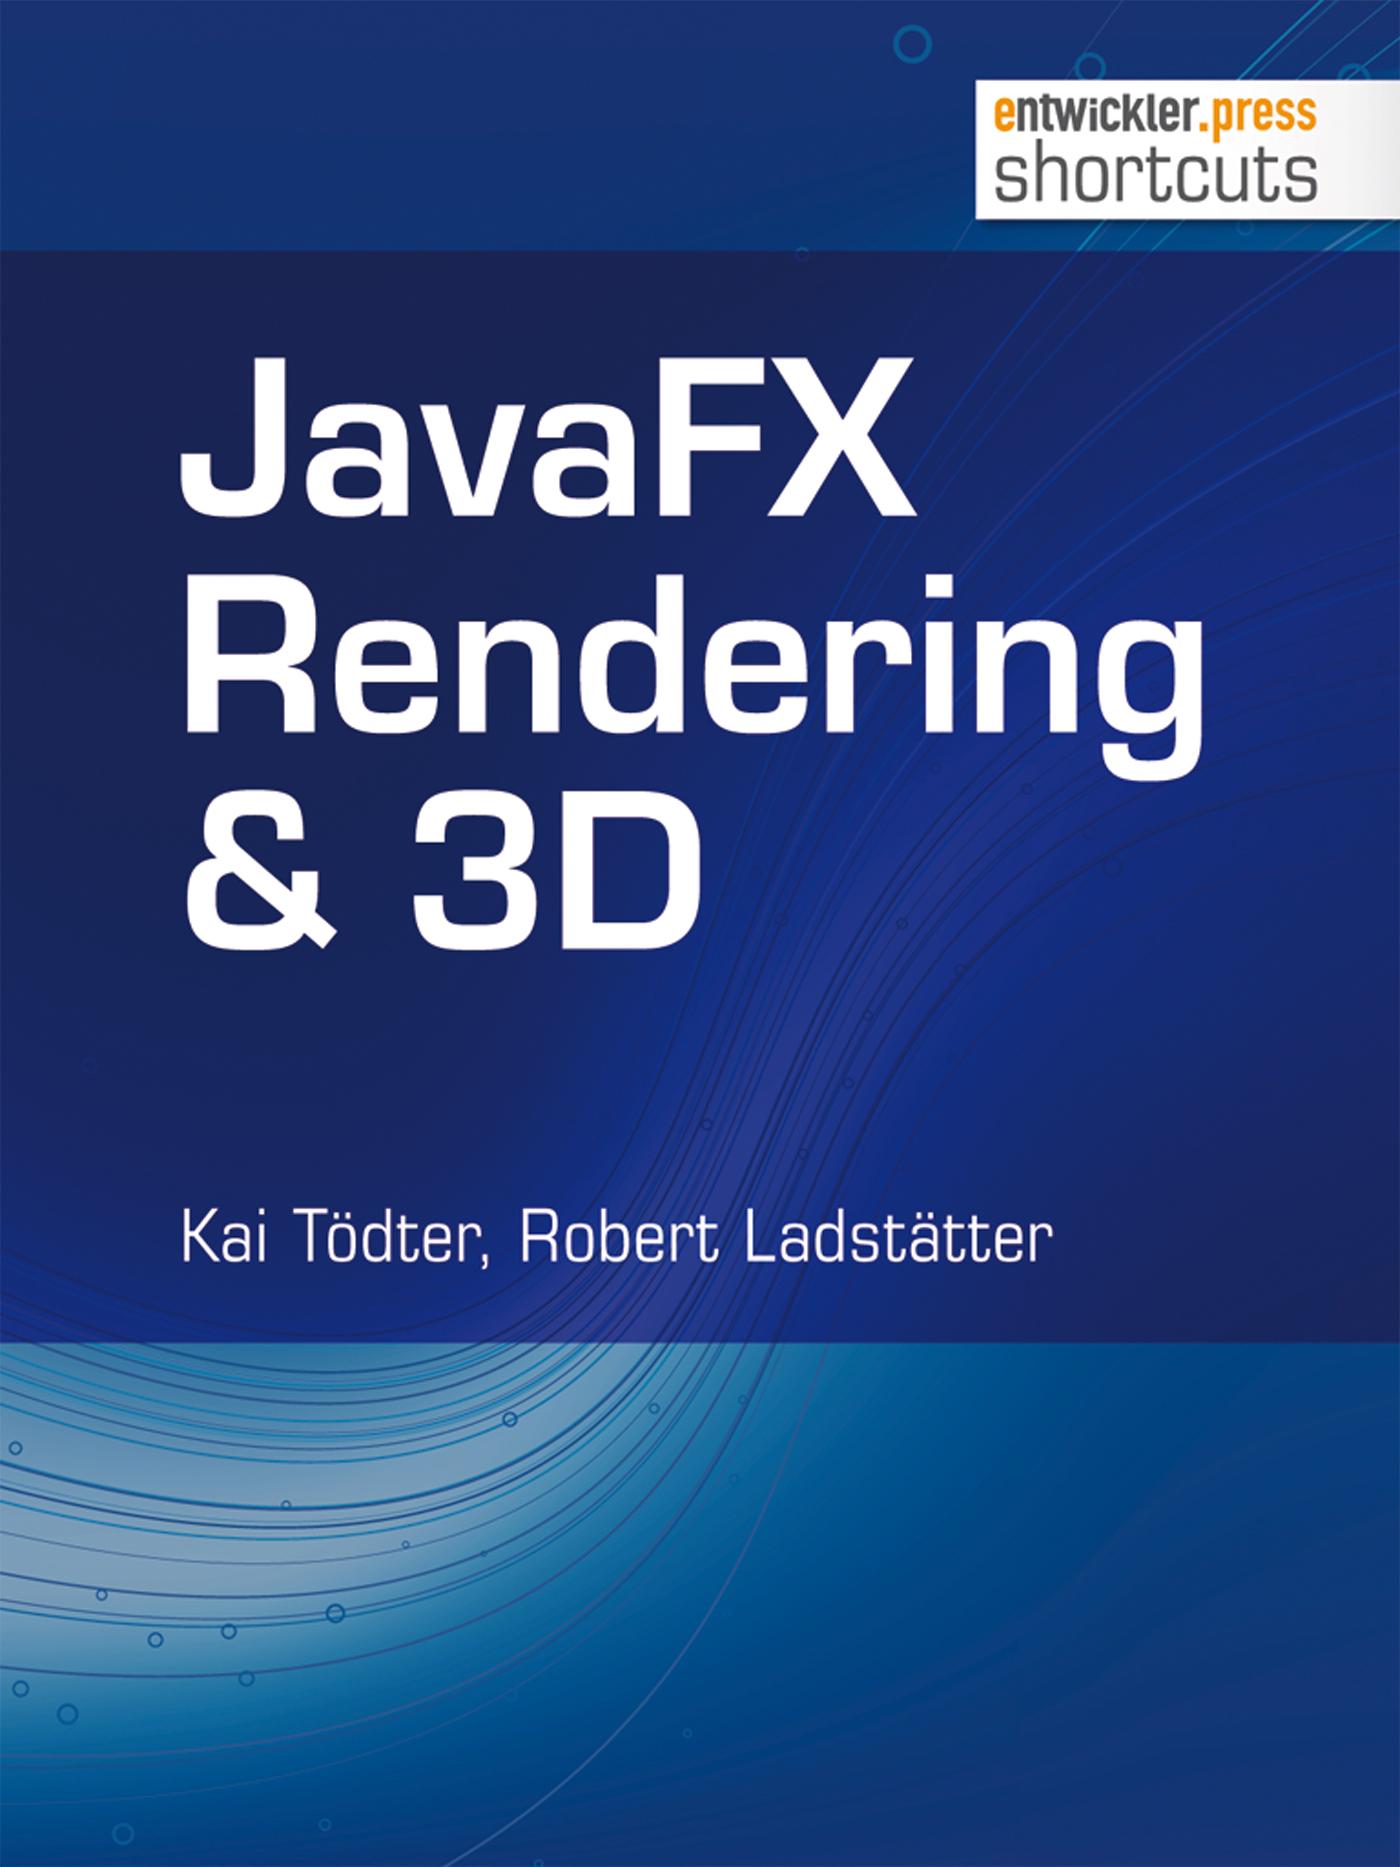 Kai Todter JavaFX Rendering & 3D mohamed taman javafx essentials